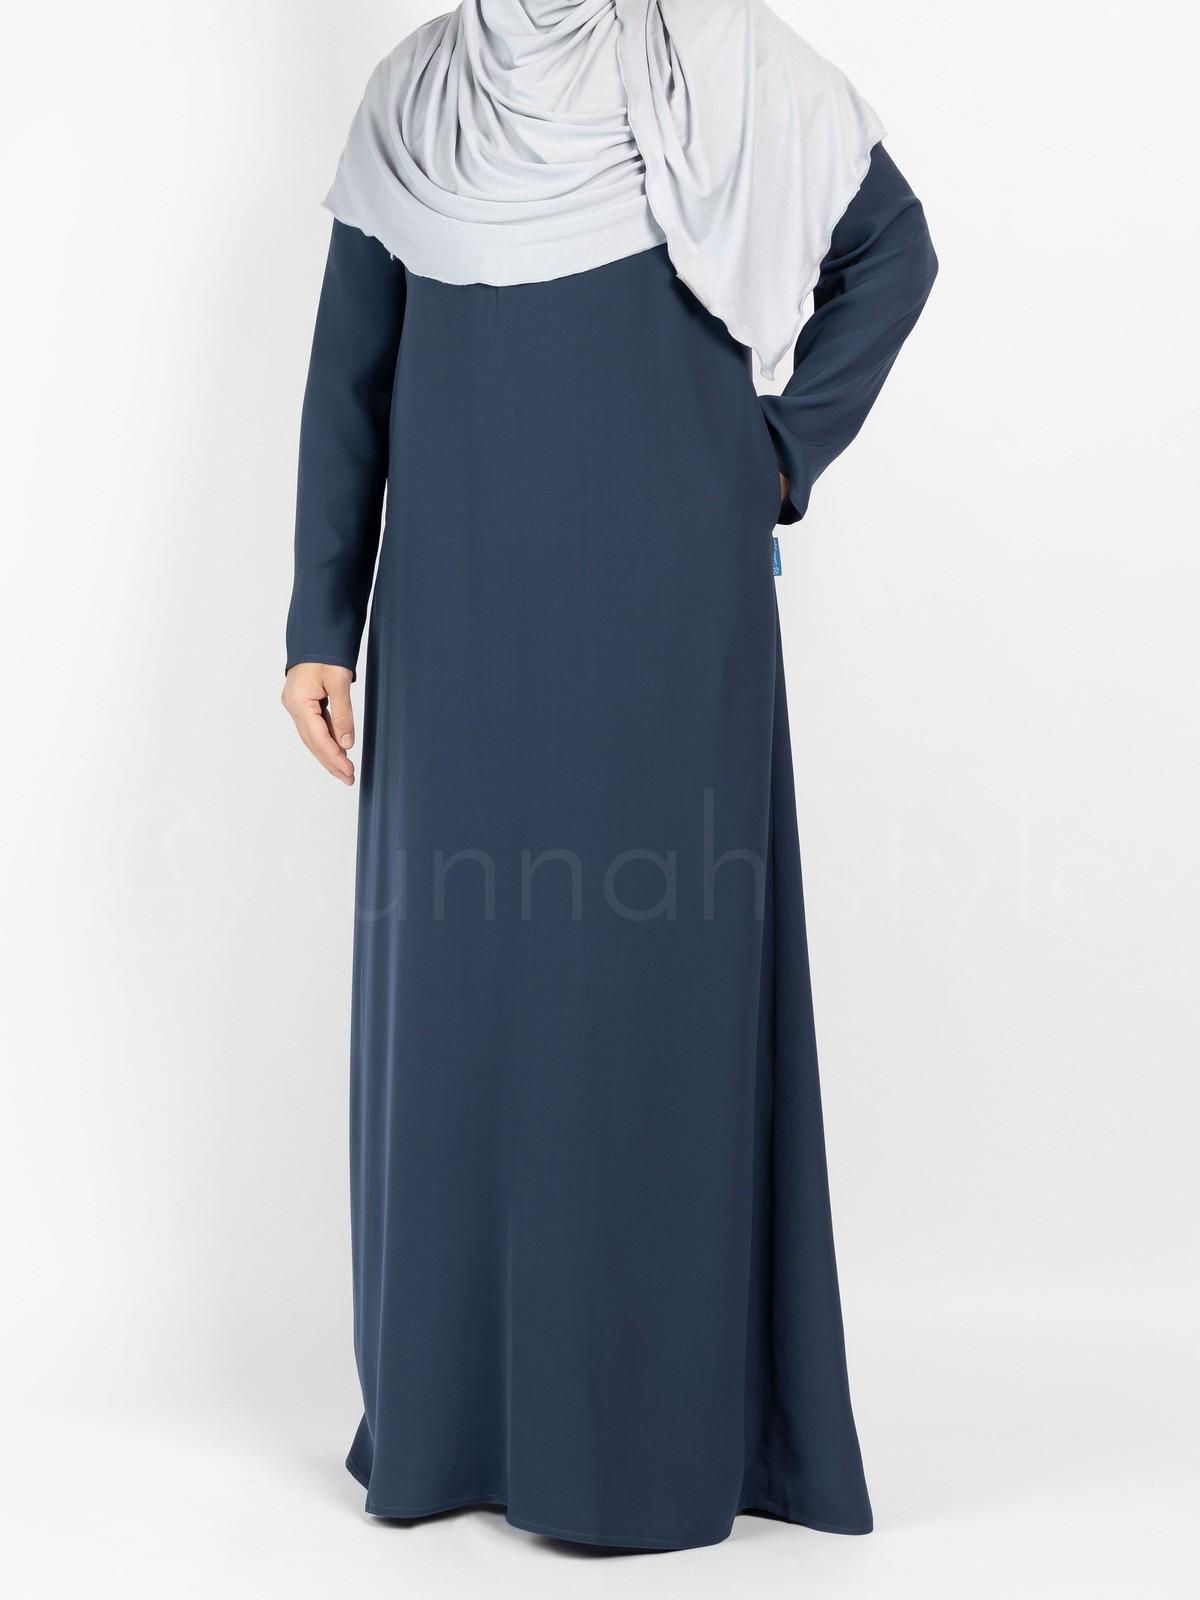 Sunnah Style - Essentials Closed Abaya - SLIM (Steel Blue)